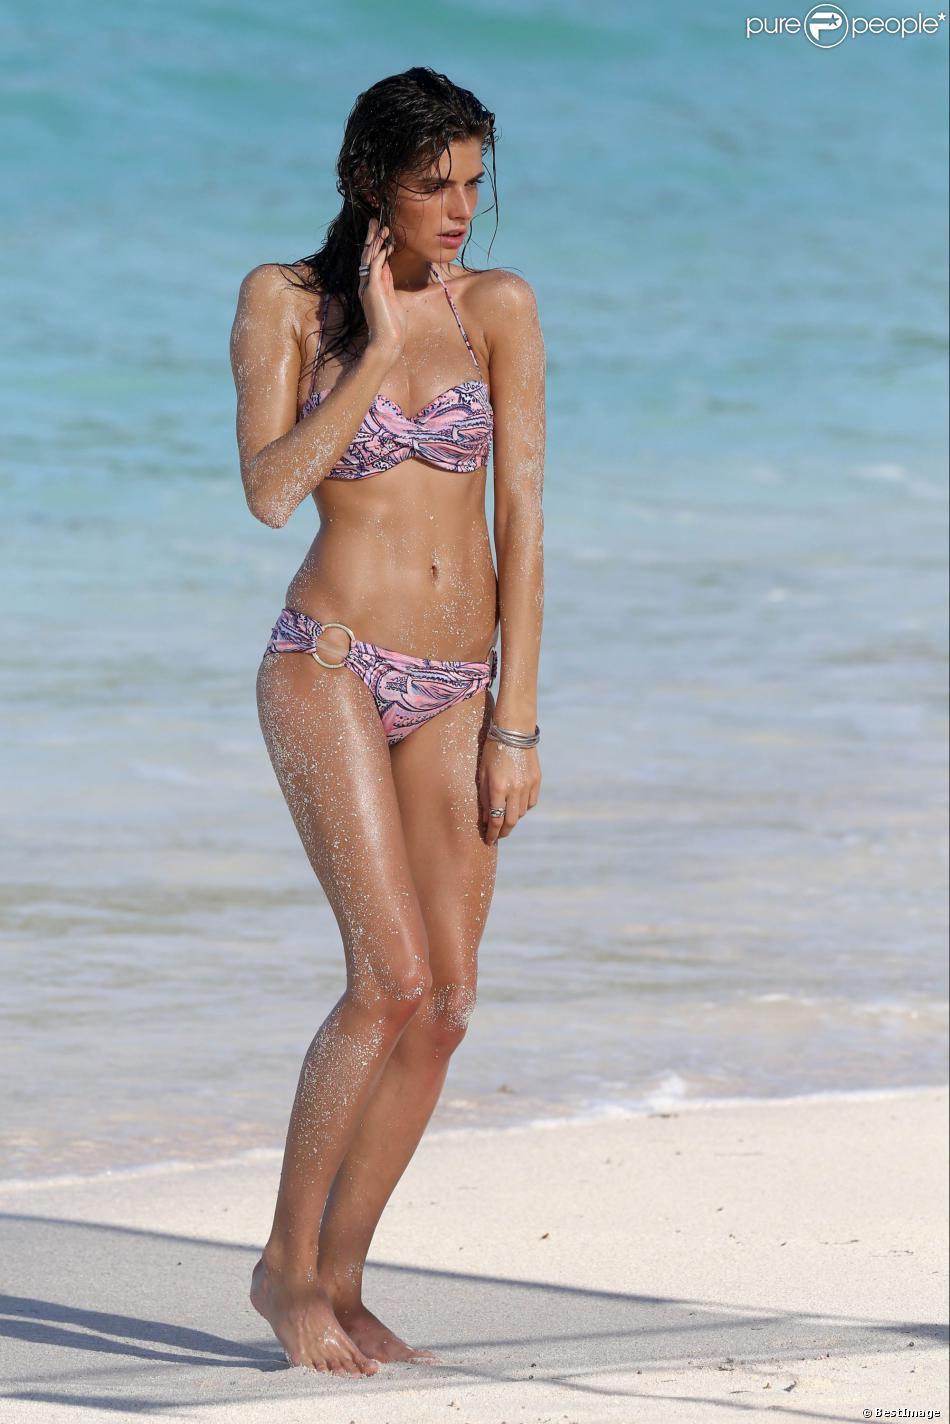 Photos de femmes russes en bikini - frphotoswomenscom